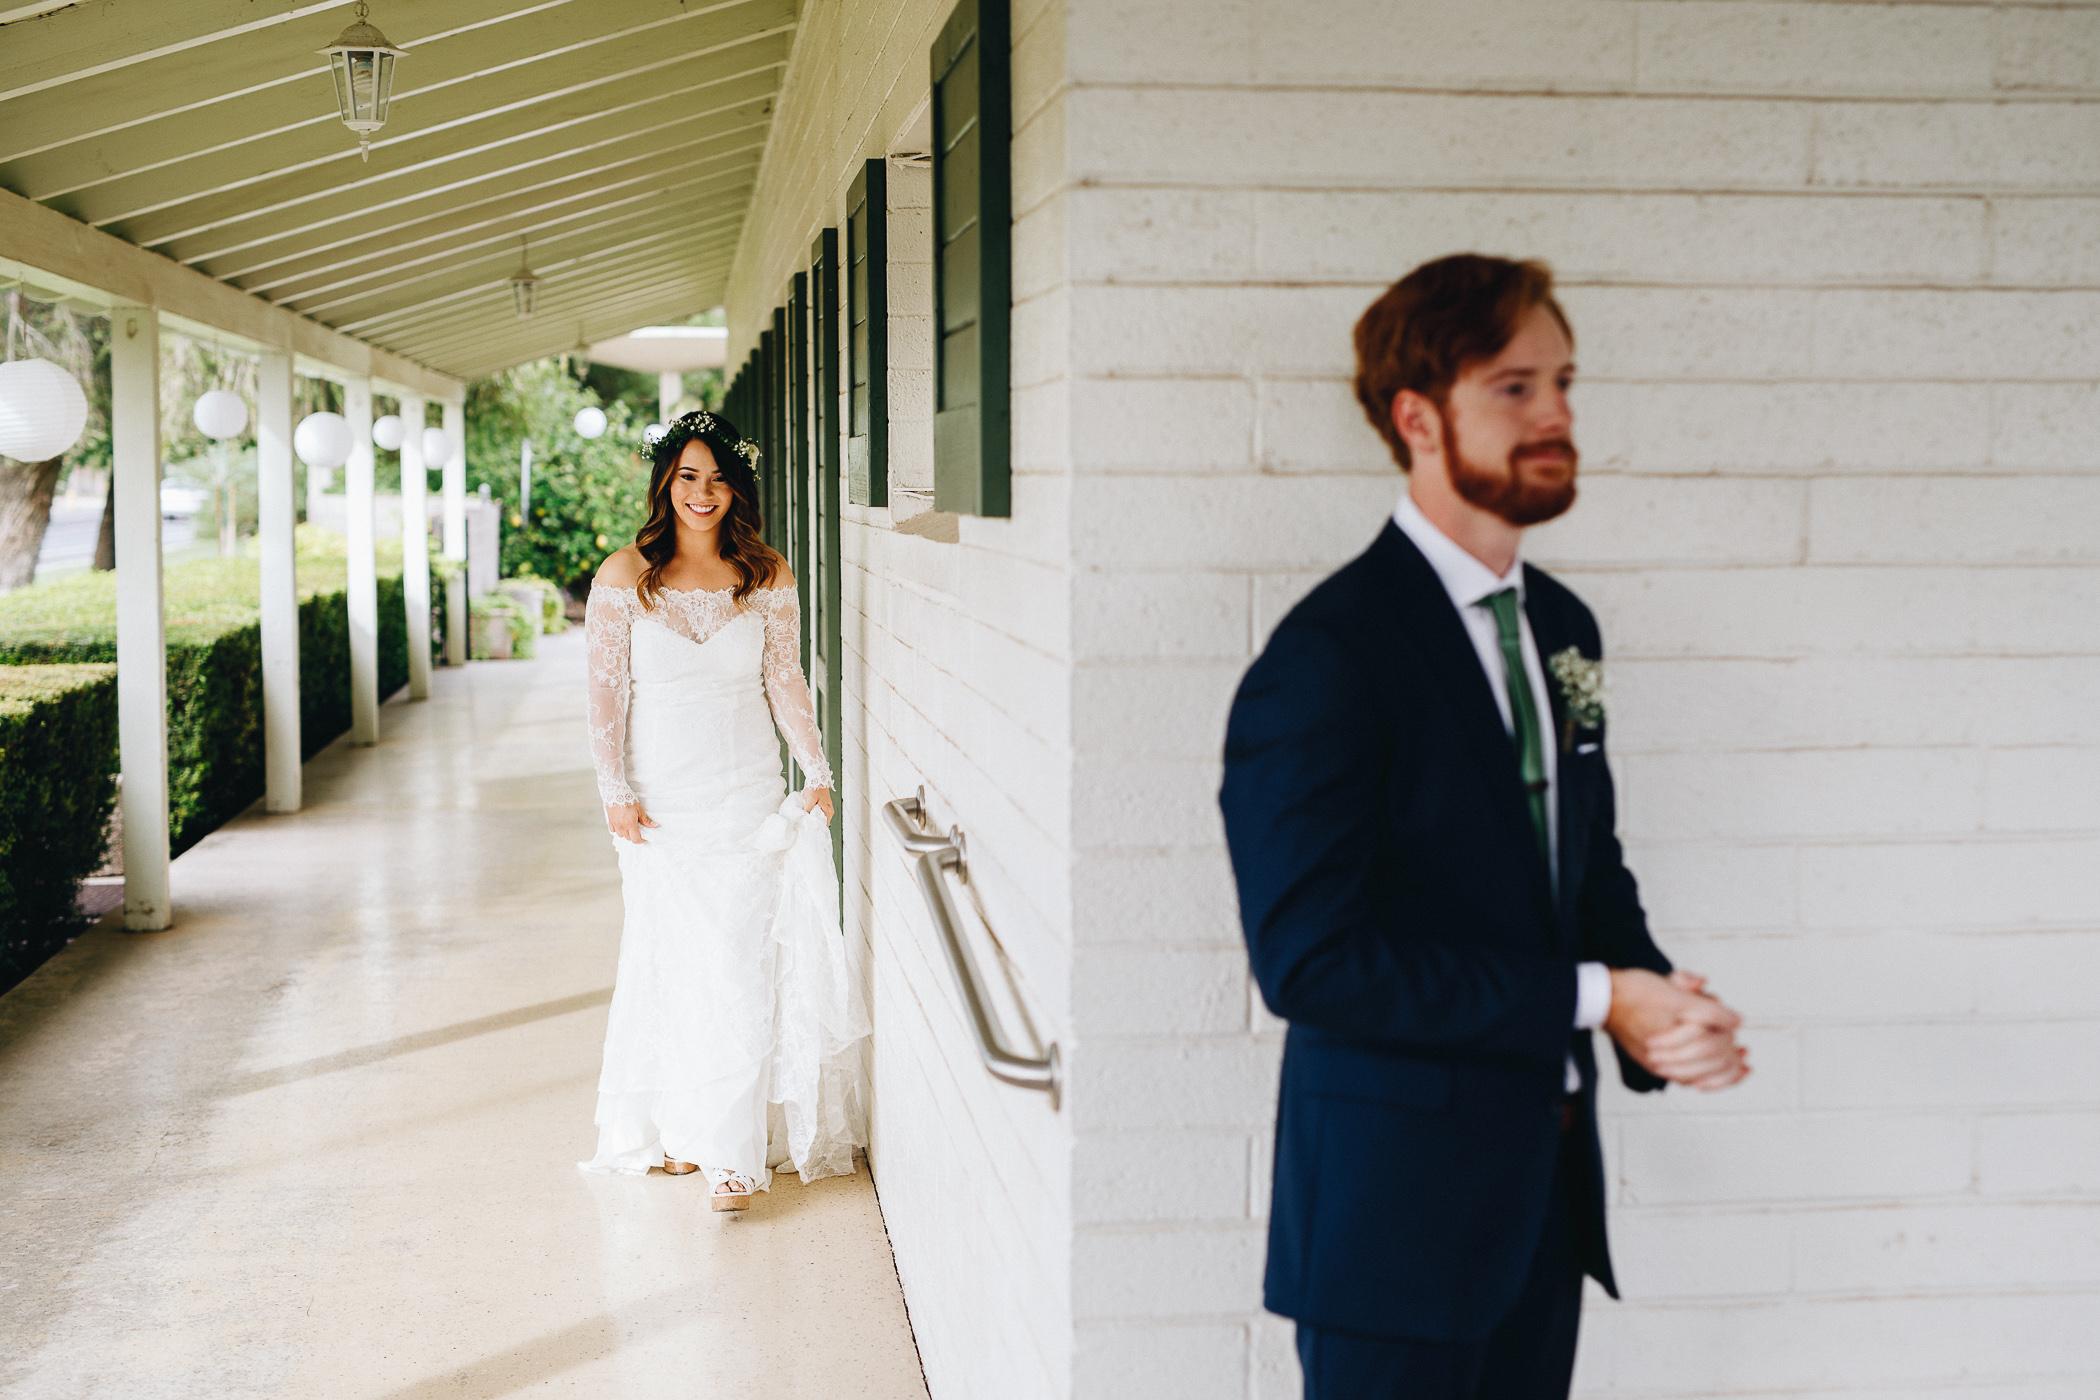 181104-Luxium-Weddings-Arizona-@matt__Le-Brandon-Kariana-Phoenix-Valley-Garden-Center-1041.jpg